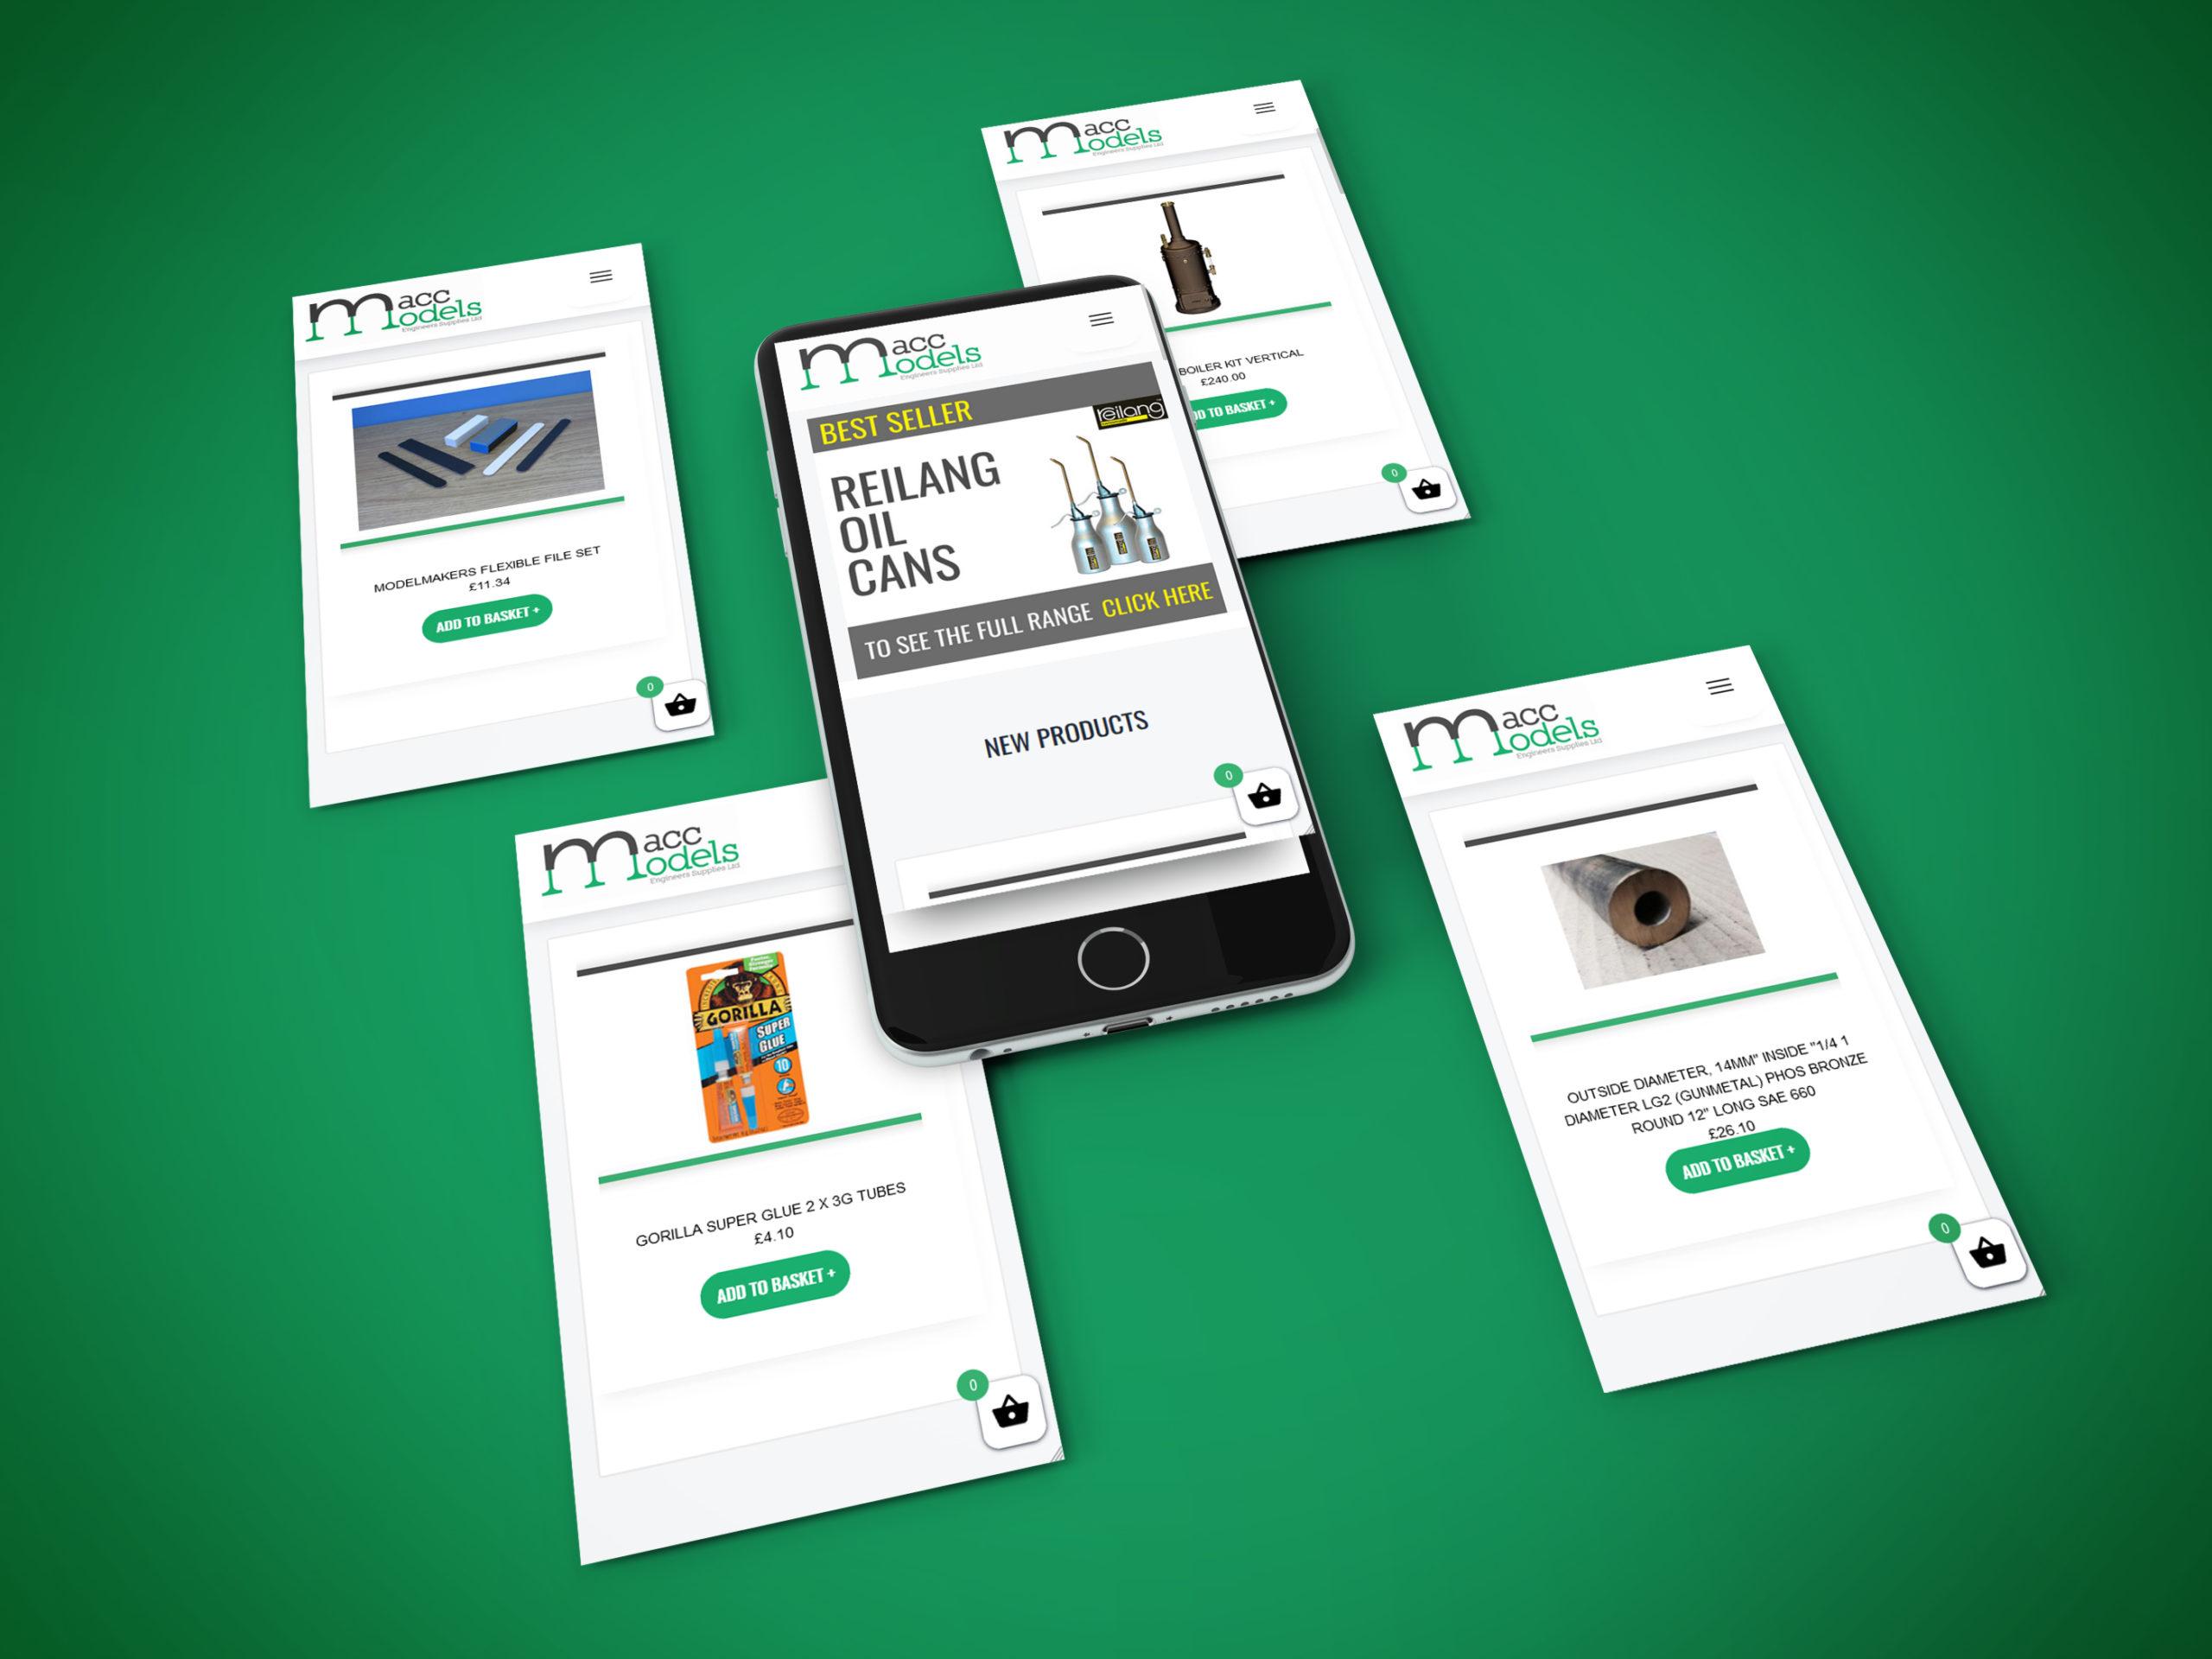 iPhone-Screens-Mockup-maccmodles